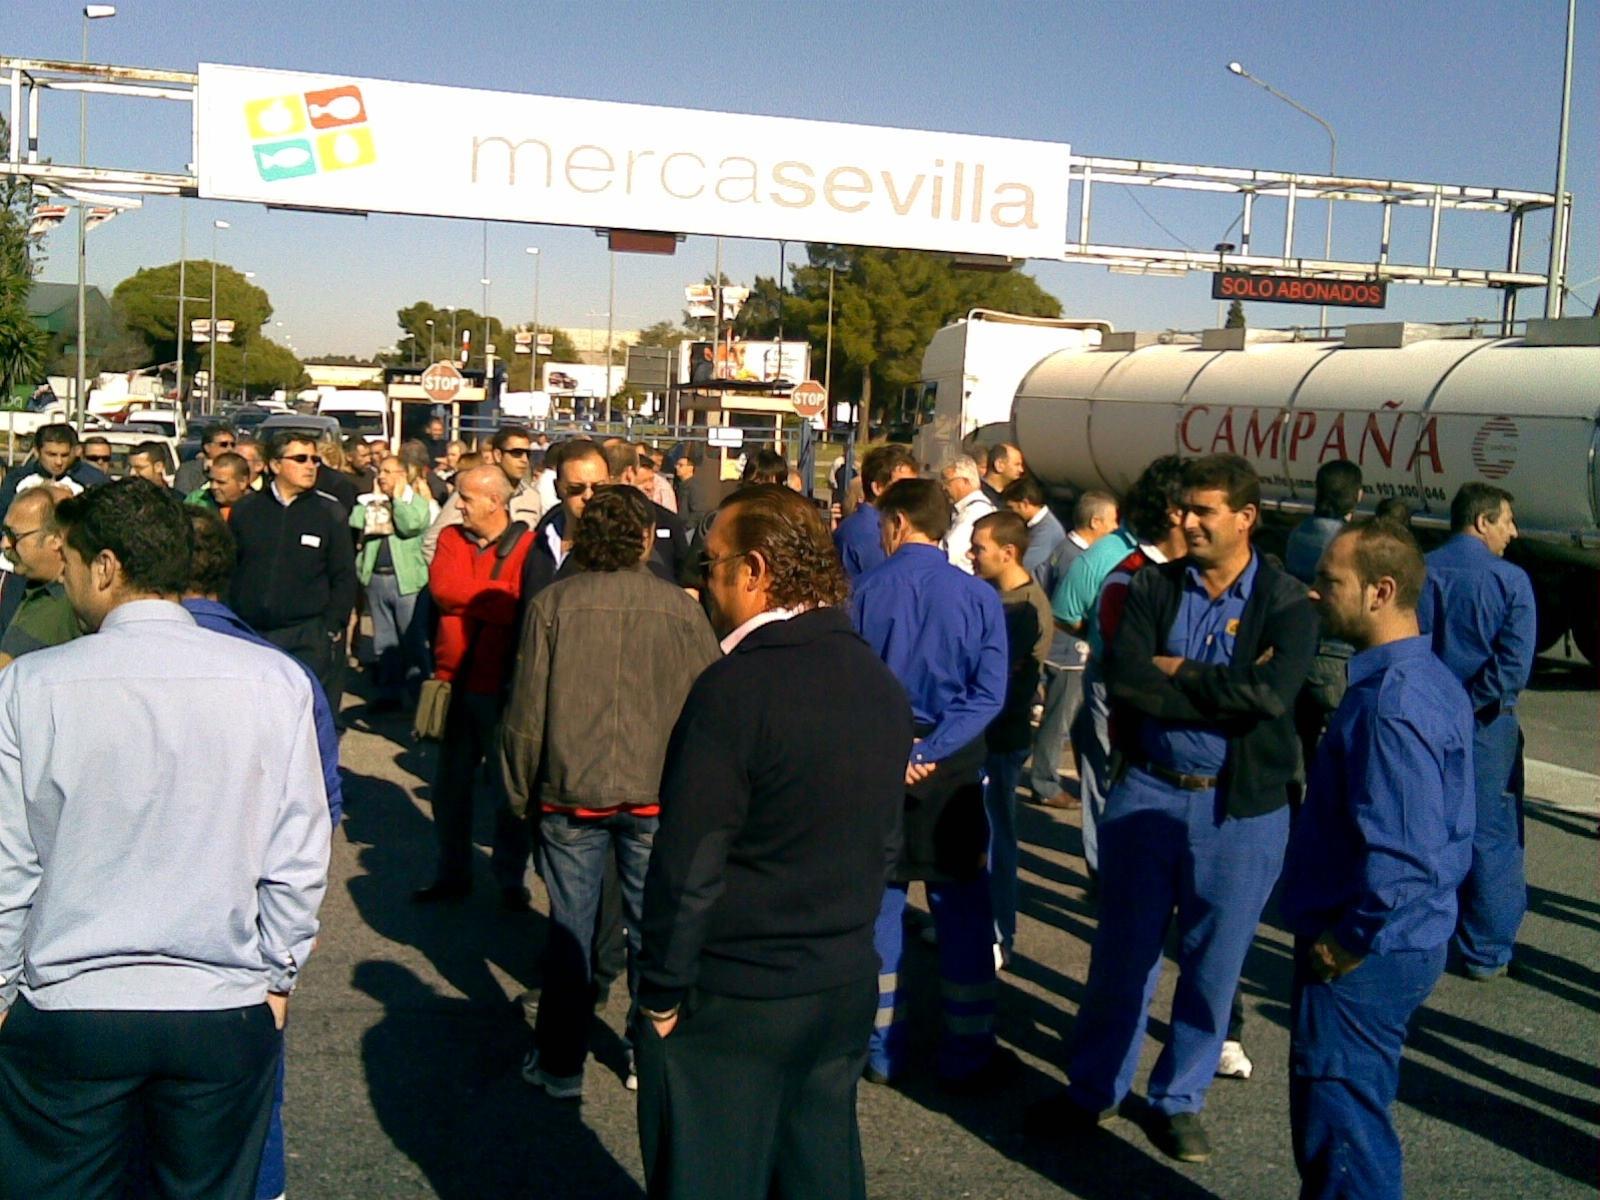 Asamblea general de trabajadores en Mercasevilla al prosperar la liberalización de la lonja